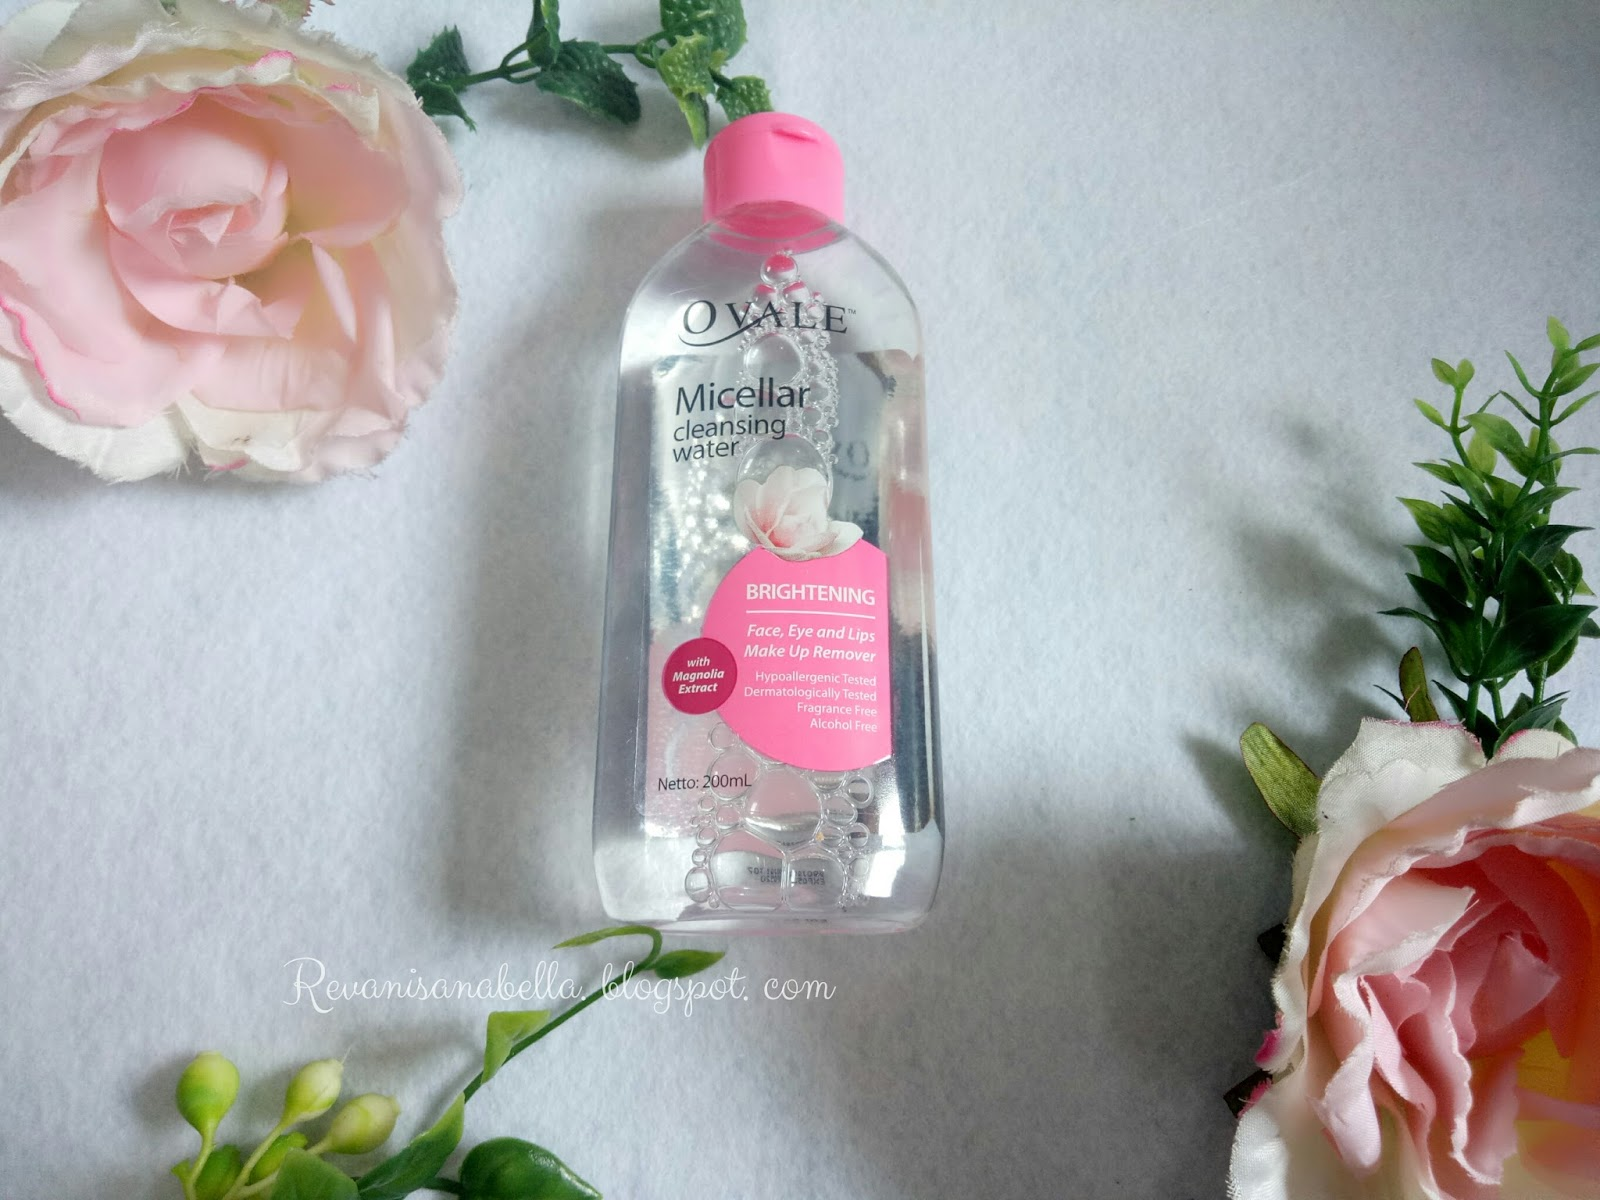 Review Ponds White Beauty Brightening Micellar Water Dan Ovale Twin Pack 200ml Tekstur Bau